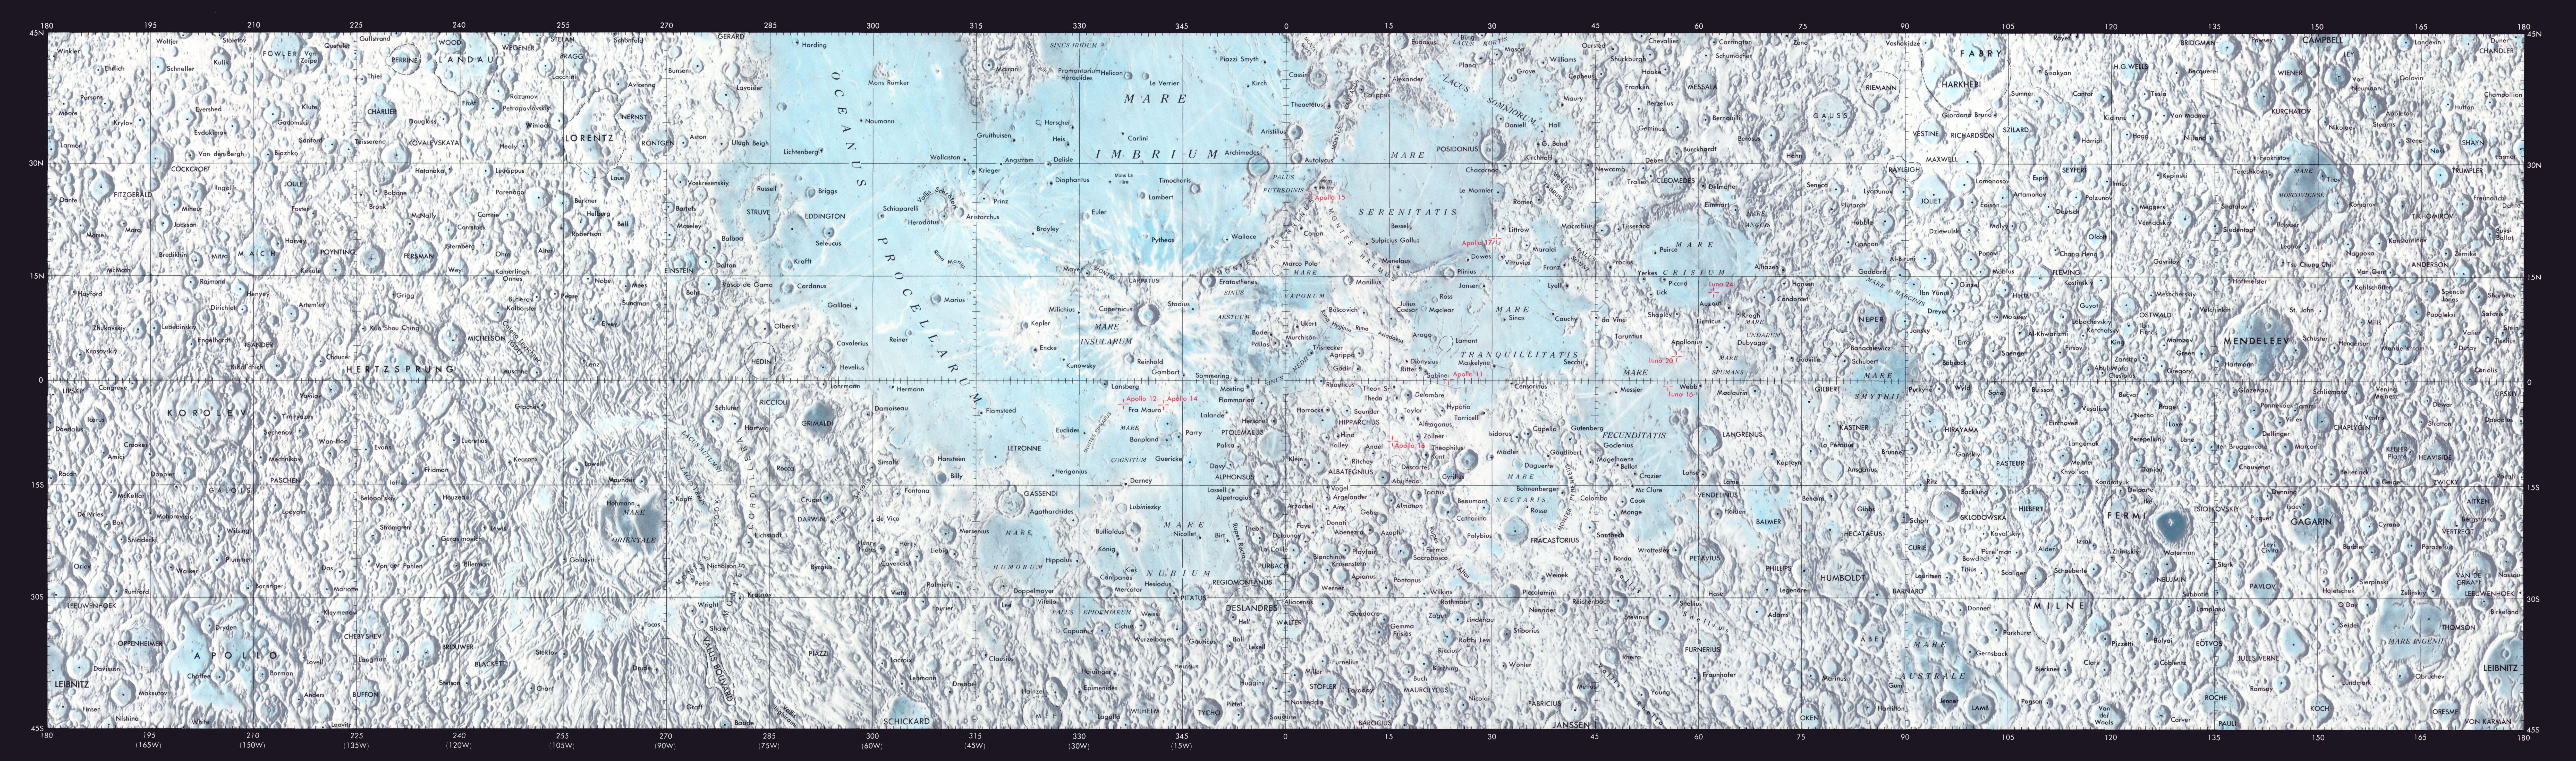 Moon Chart: Moon Map - Equatorial region 45S to 45N - LPC1 - NASA.jpg ,Chart